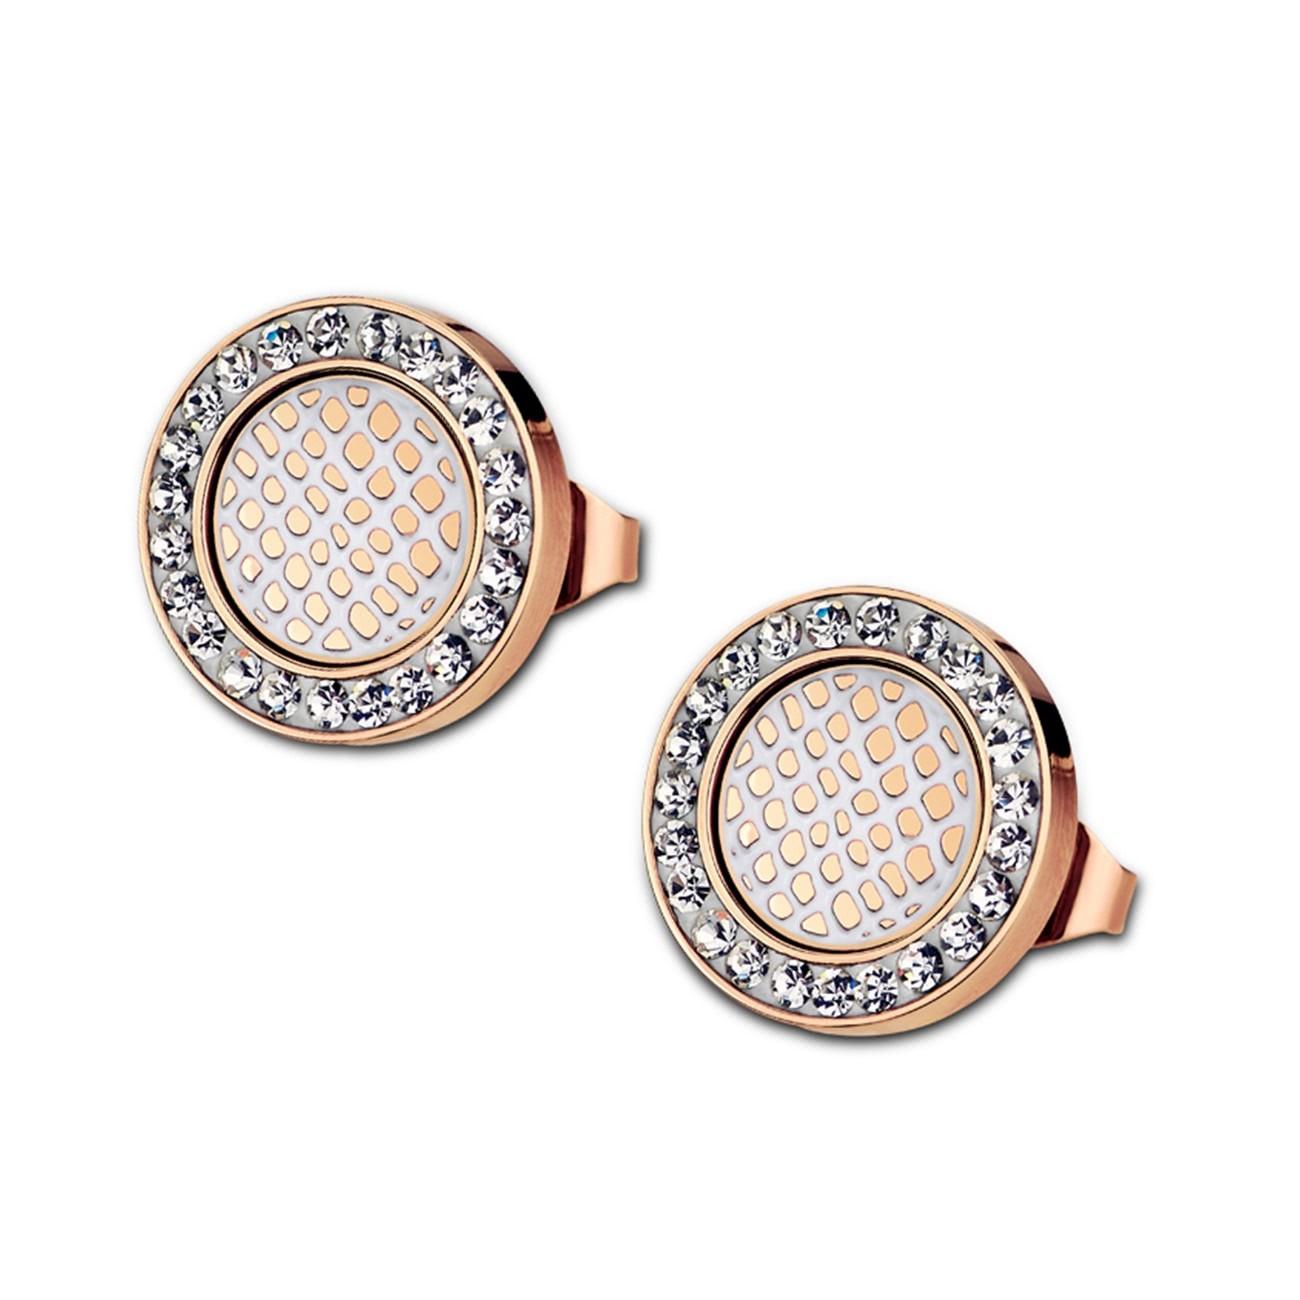 LOTUS Style Ohrringe Damen Edelstahl silber LS1778-4/2 Ohrstecker JLS1778-4-2